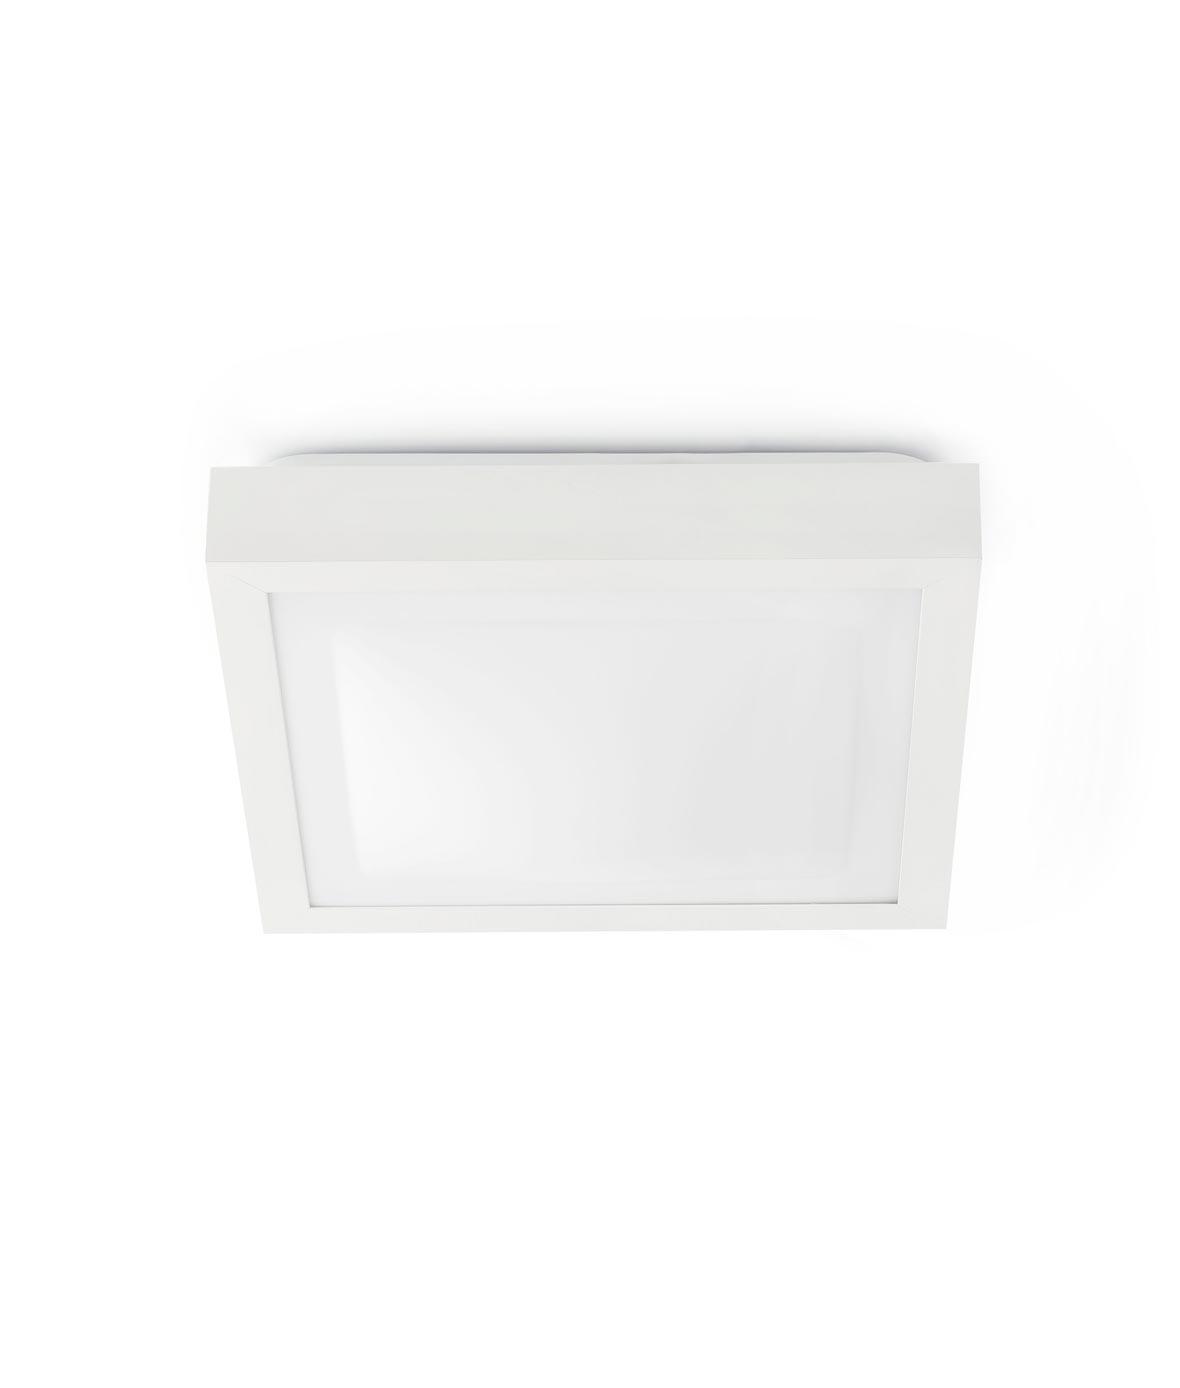 Plafón blanco 1 luz TOLA